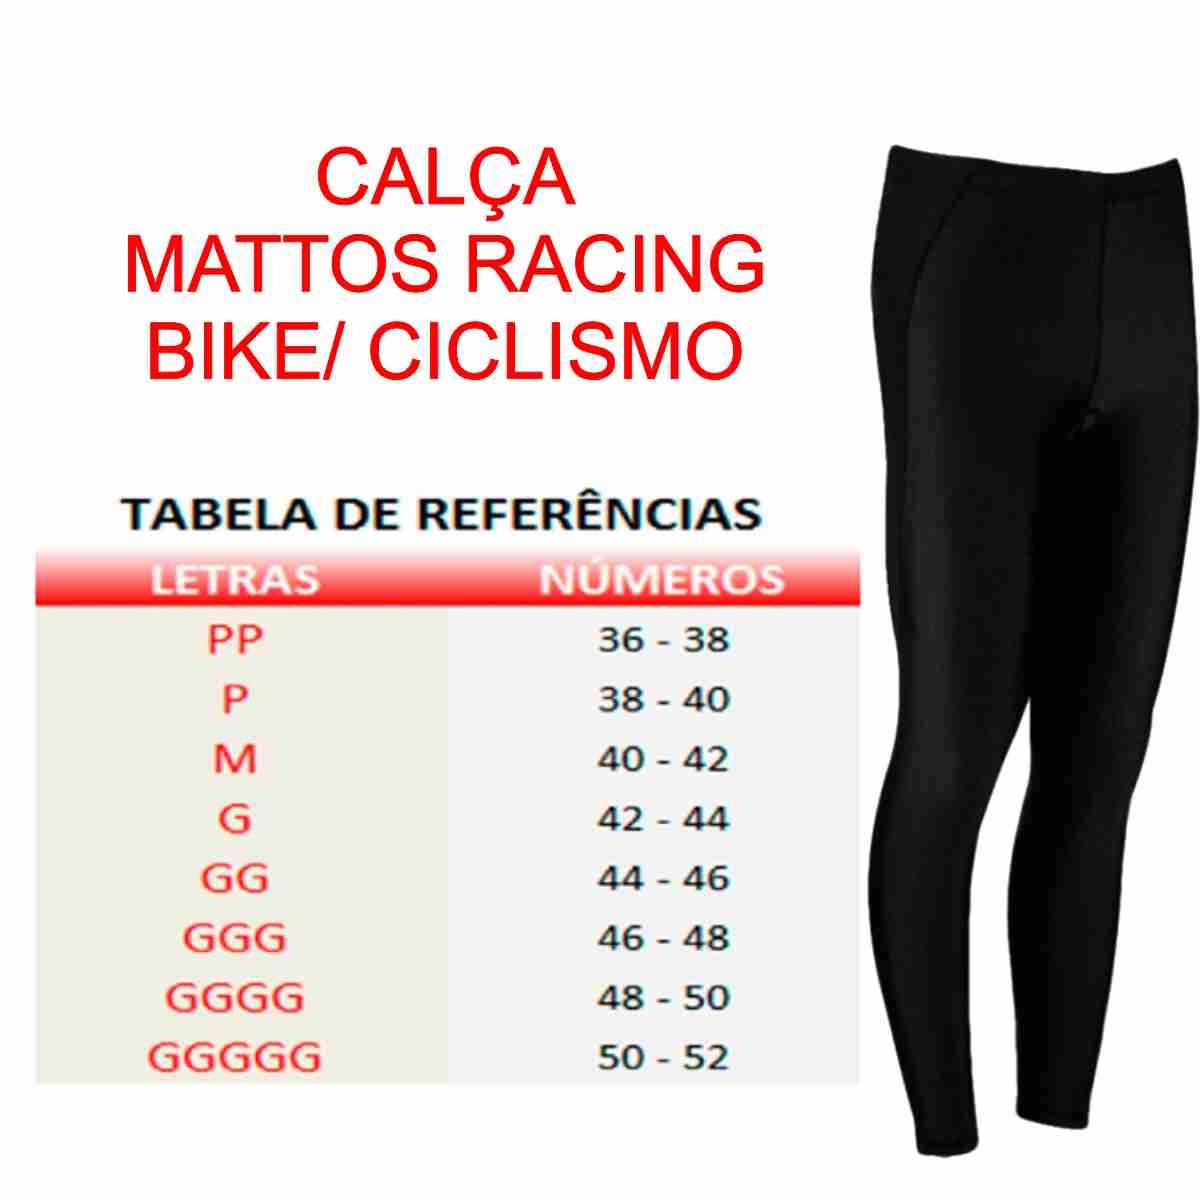 CALÇA MATTOS RACING MASCULINO BIKE CICLISMO PRETO